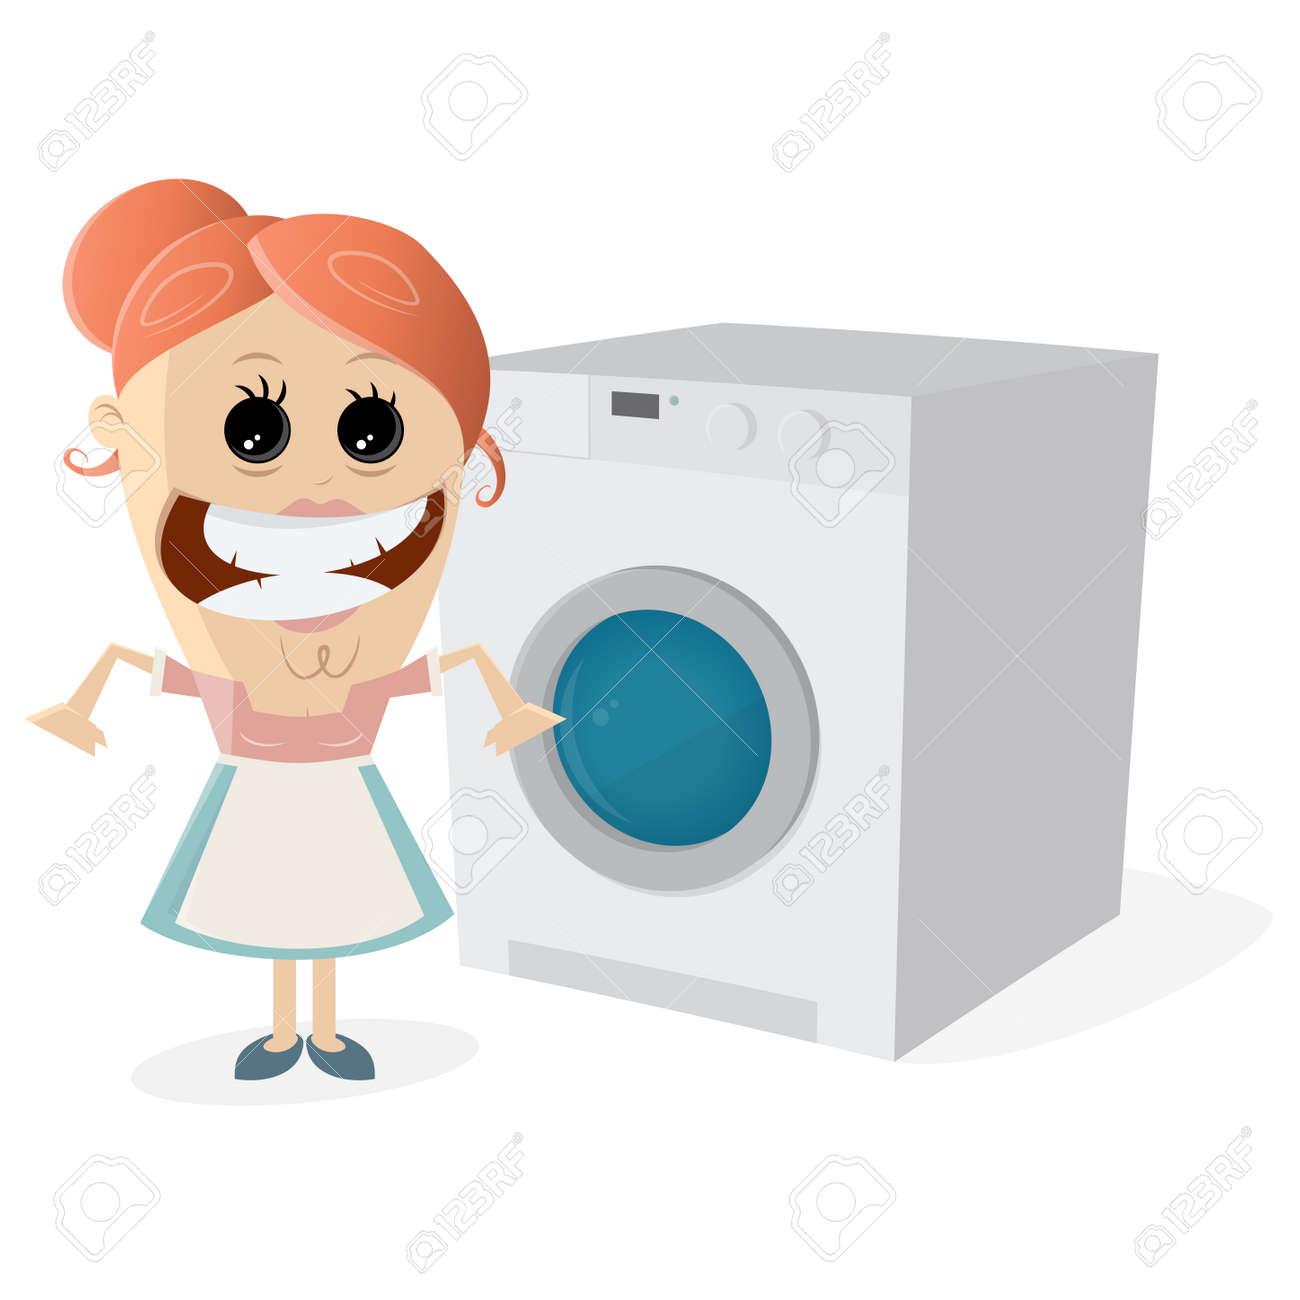 Happy housewife with washing machine Standard-Bild - 85173434